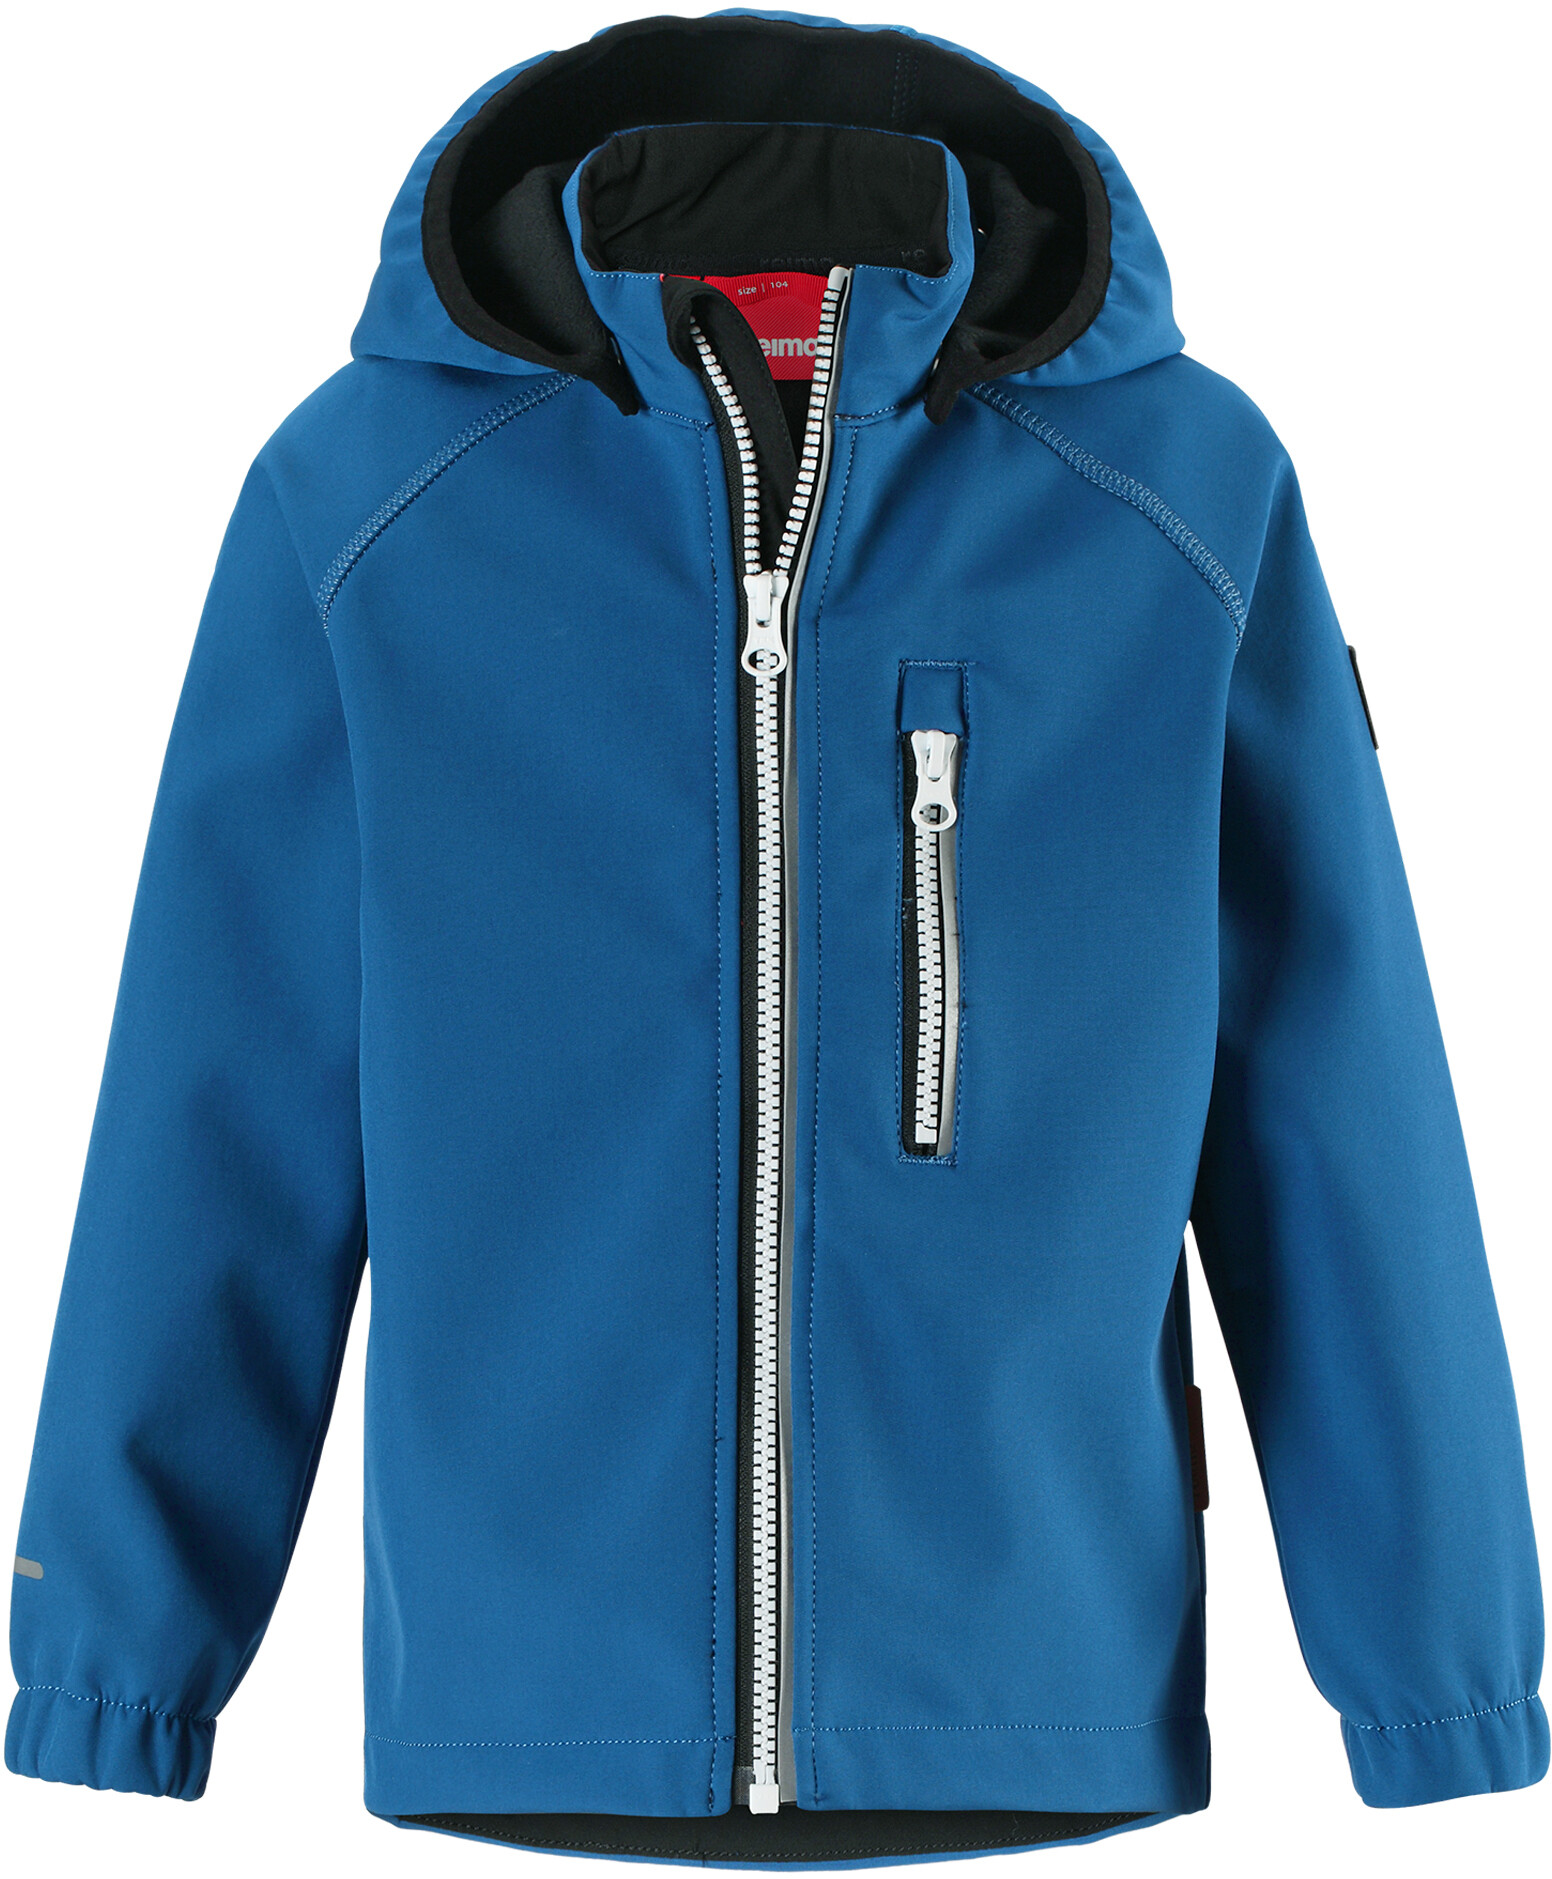 507b8f8b Reima Vantti Softshell Jacket Børn, dark denim   Find outdoortøj ...